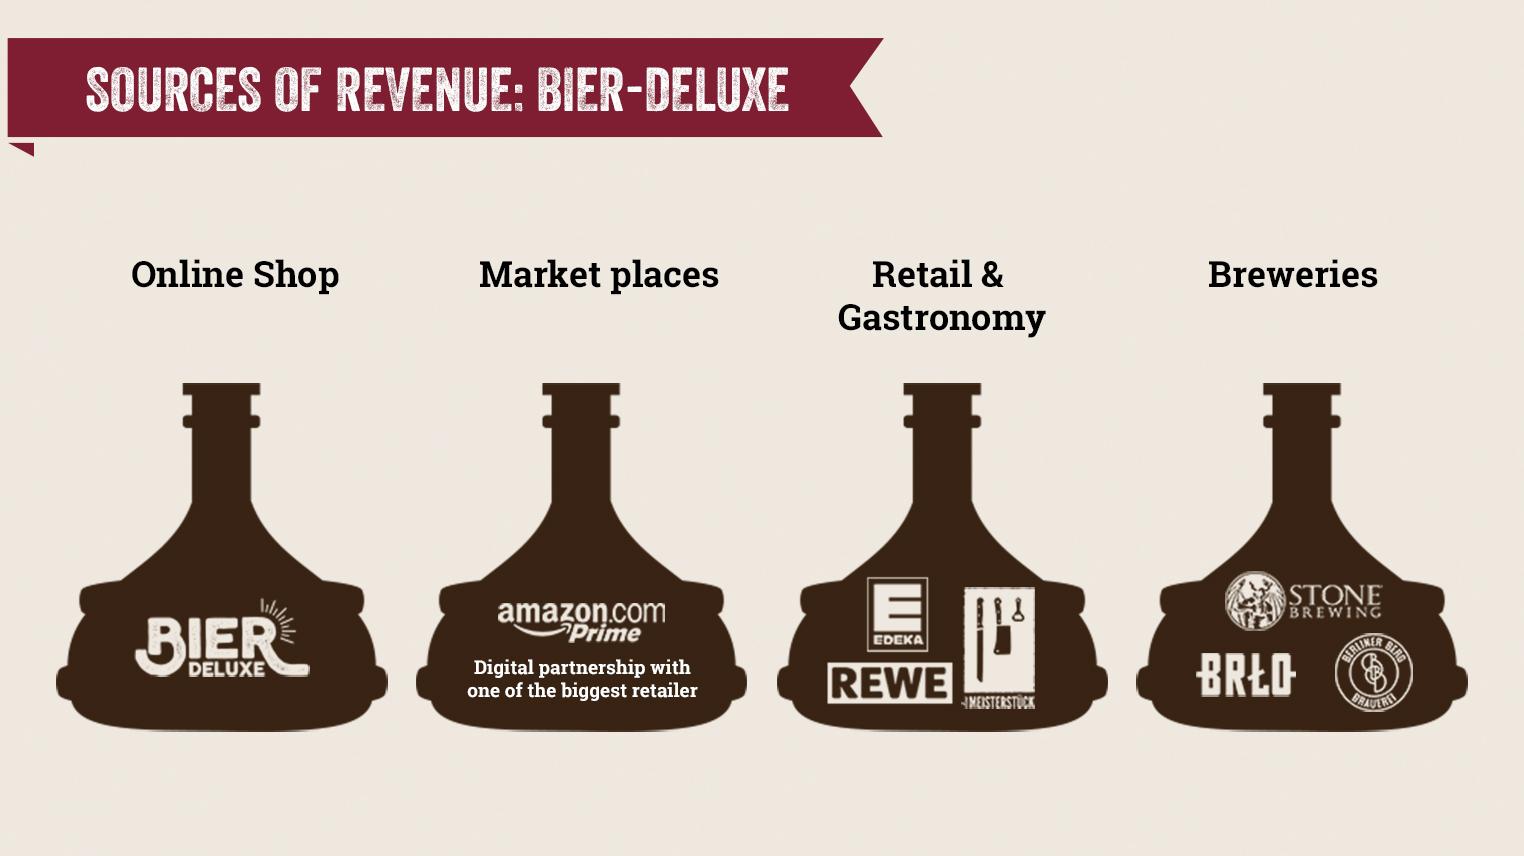 Bier-Deluxe - Sources of Revenue